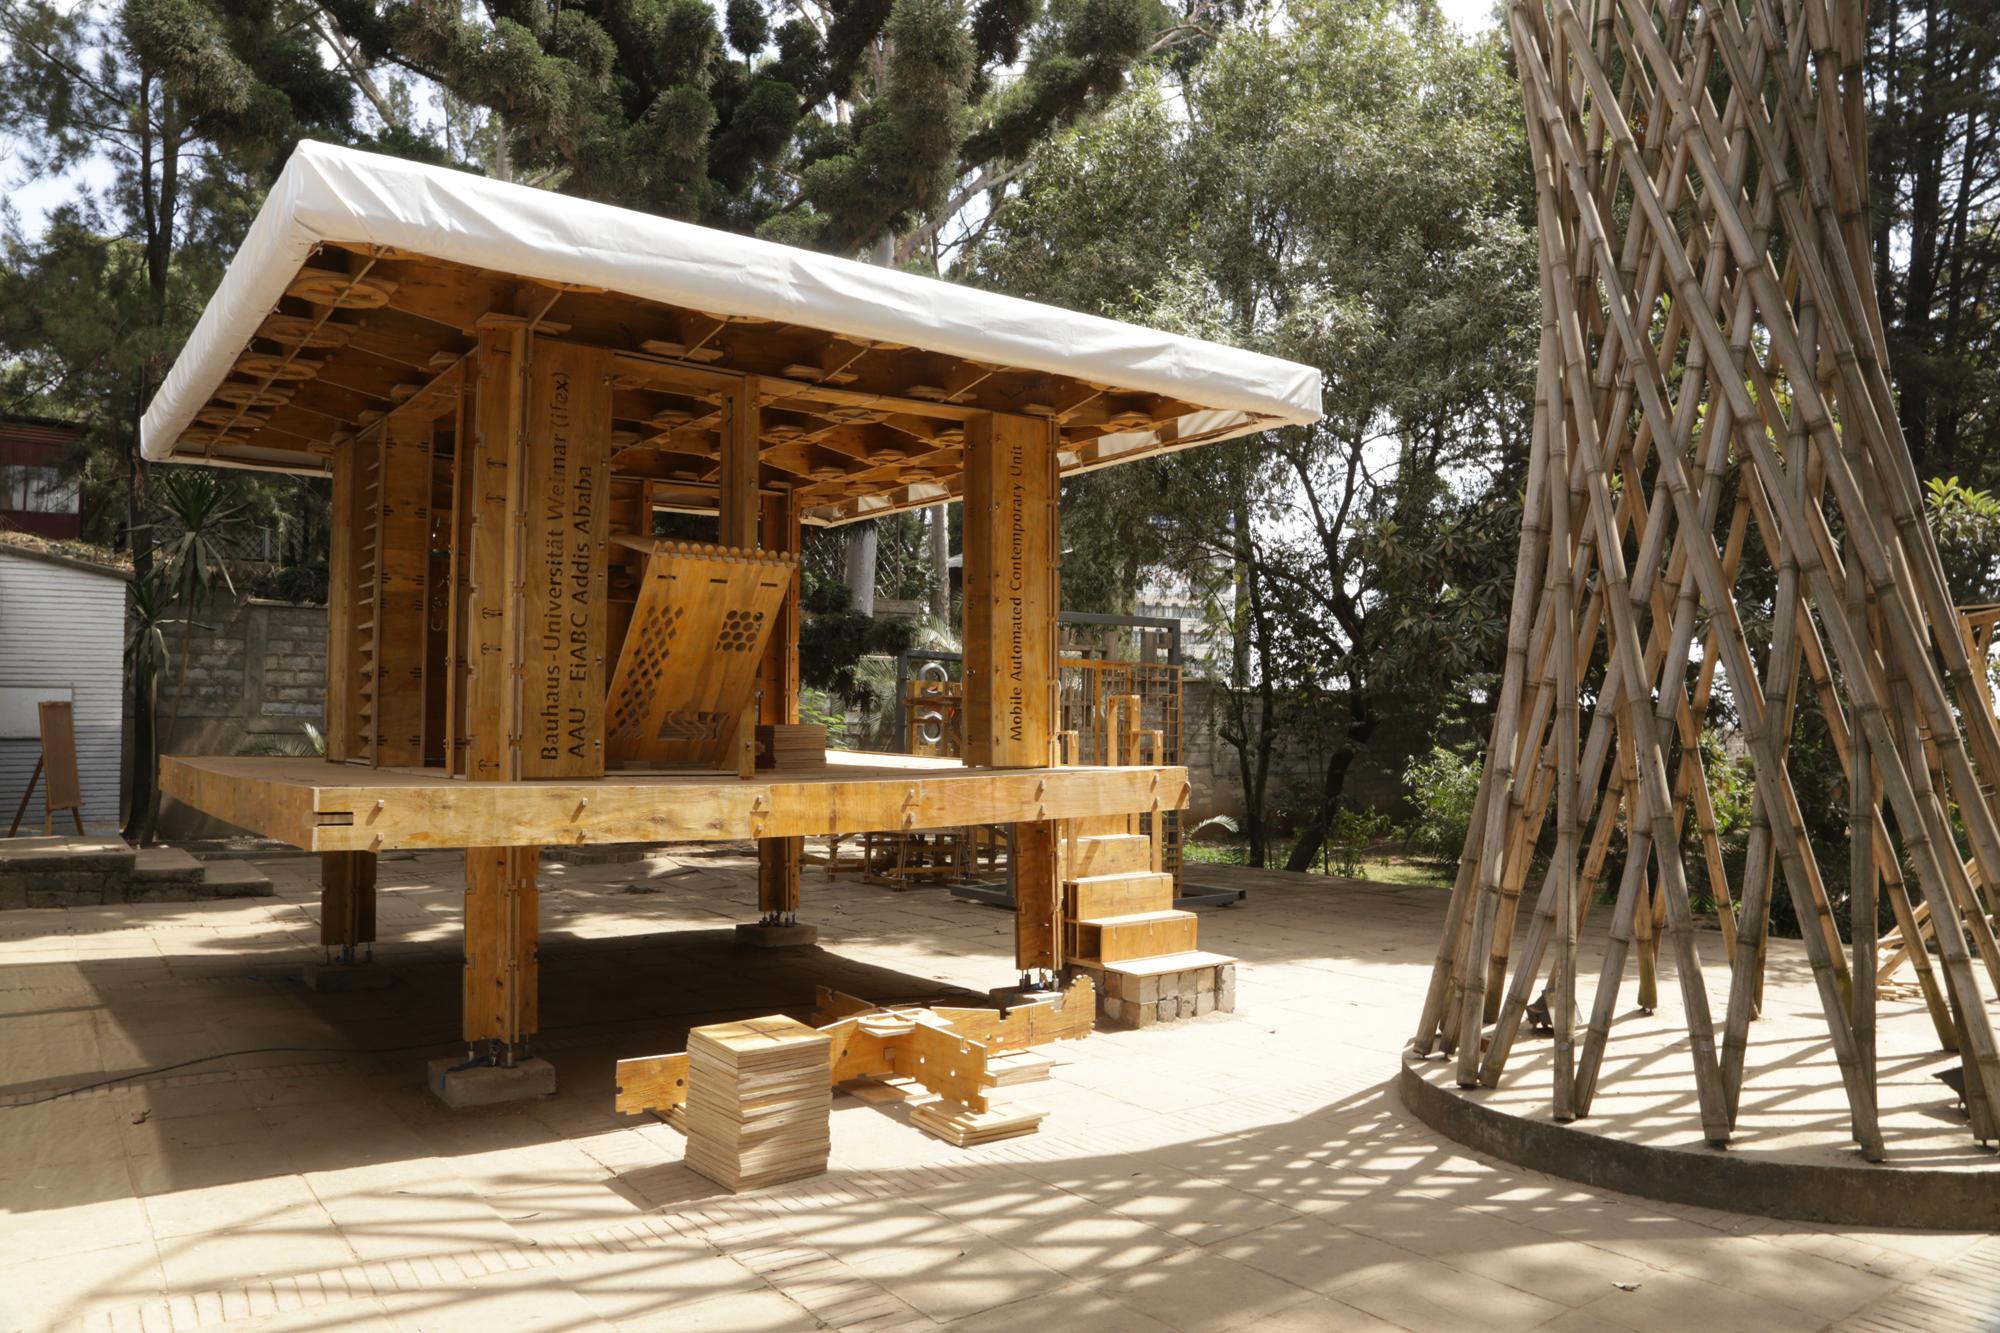 3 Experimental Homes Address Hyper Urbanization In Africa